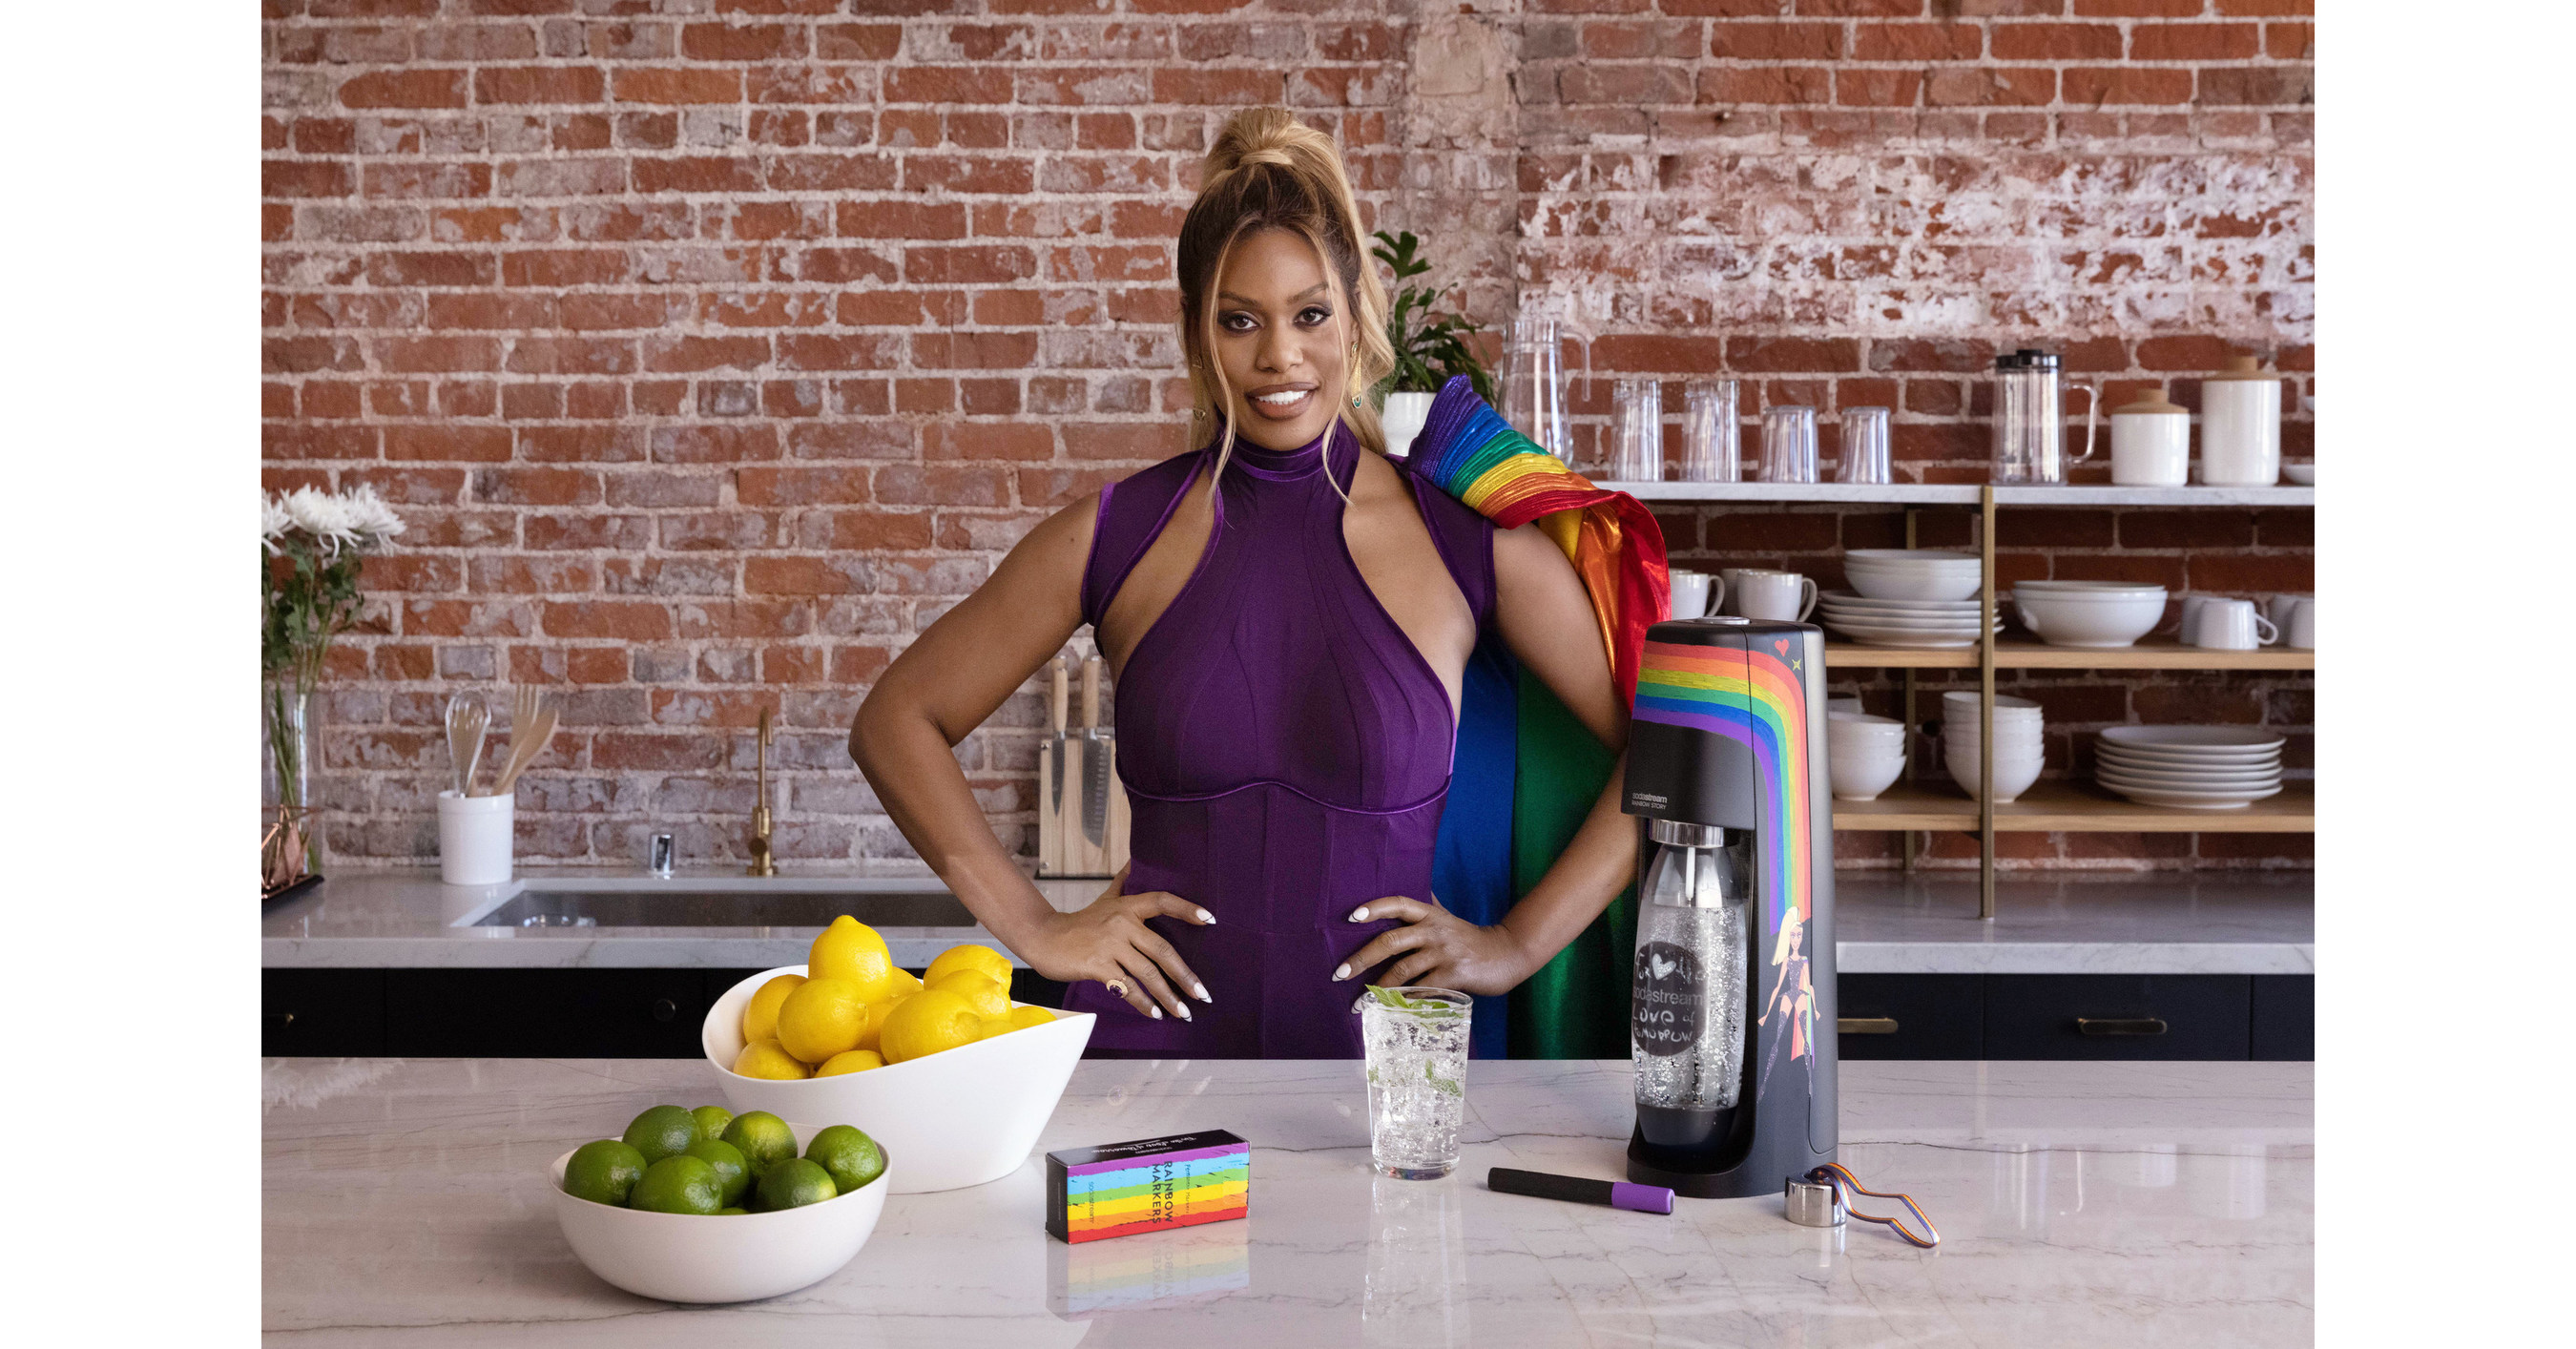 SodaStream and Star Laverne Cox Release New Pride Video Spotlighting Cox as Superhero for LGBTQI+ Rights - Canada NewsWire